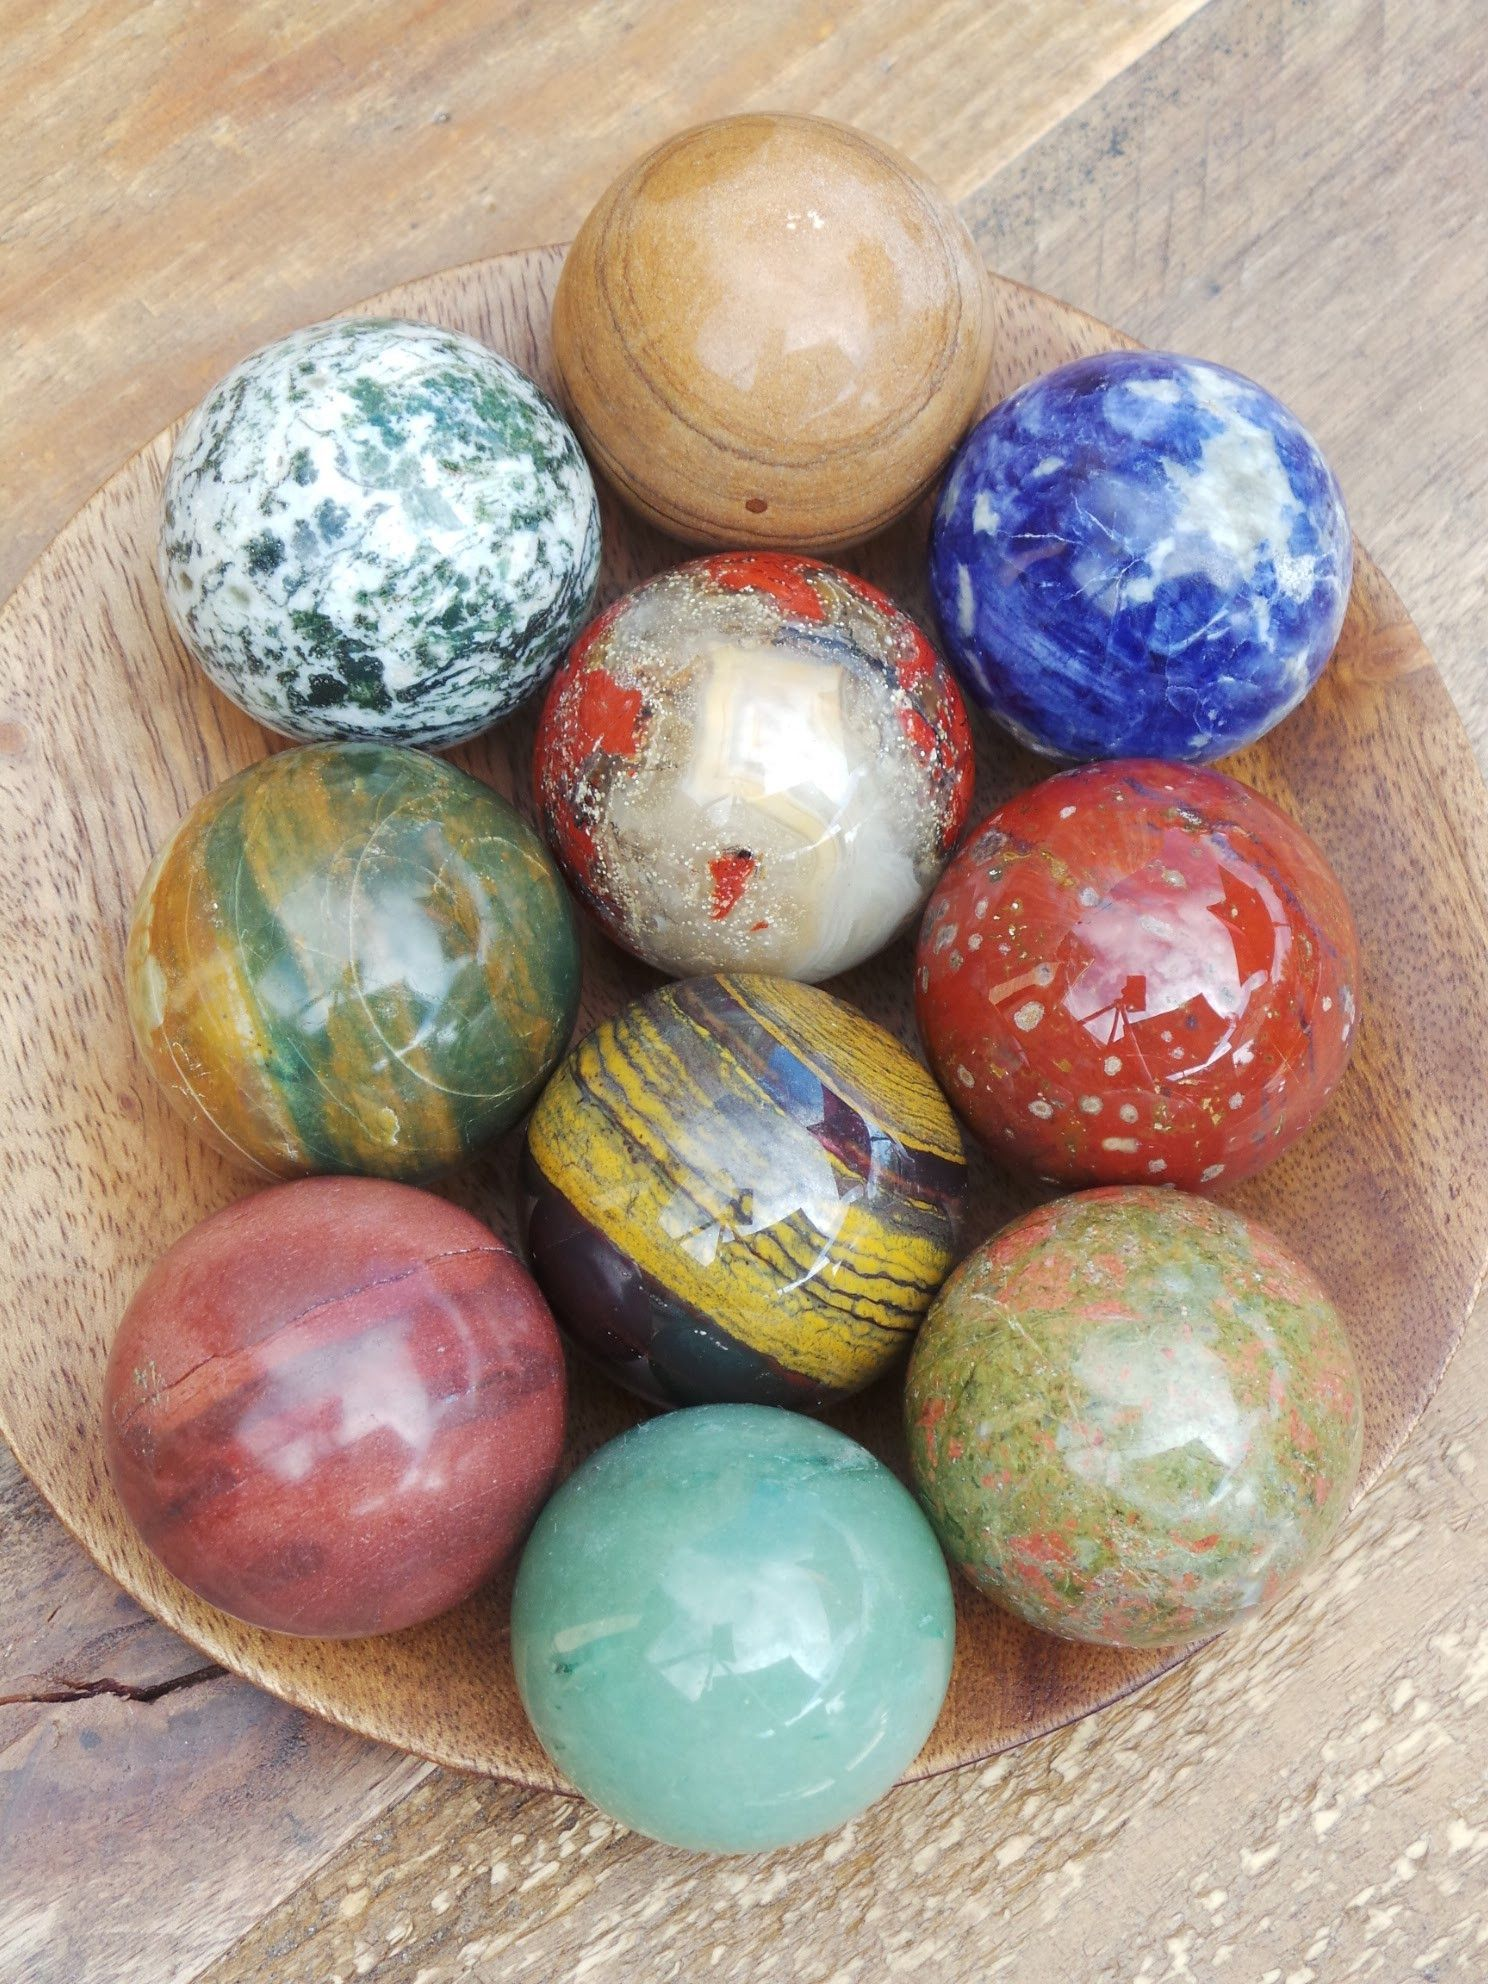 Gem Spheres - Medium Size Your Choice | Quartz crystals ...Quartz Crystal Spheres For Sale